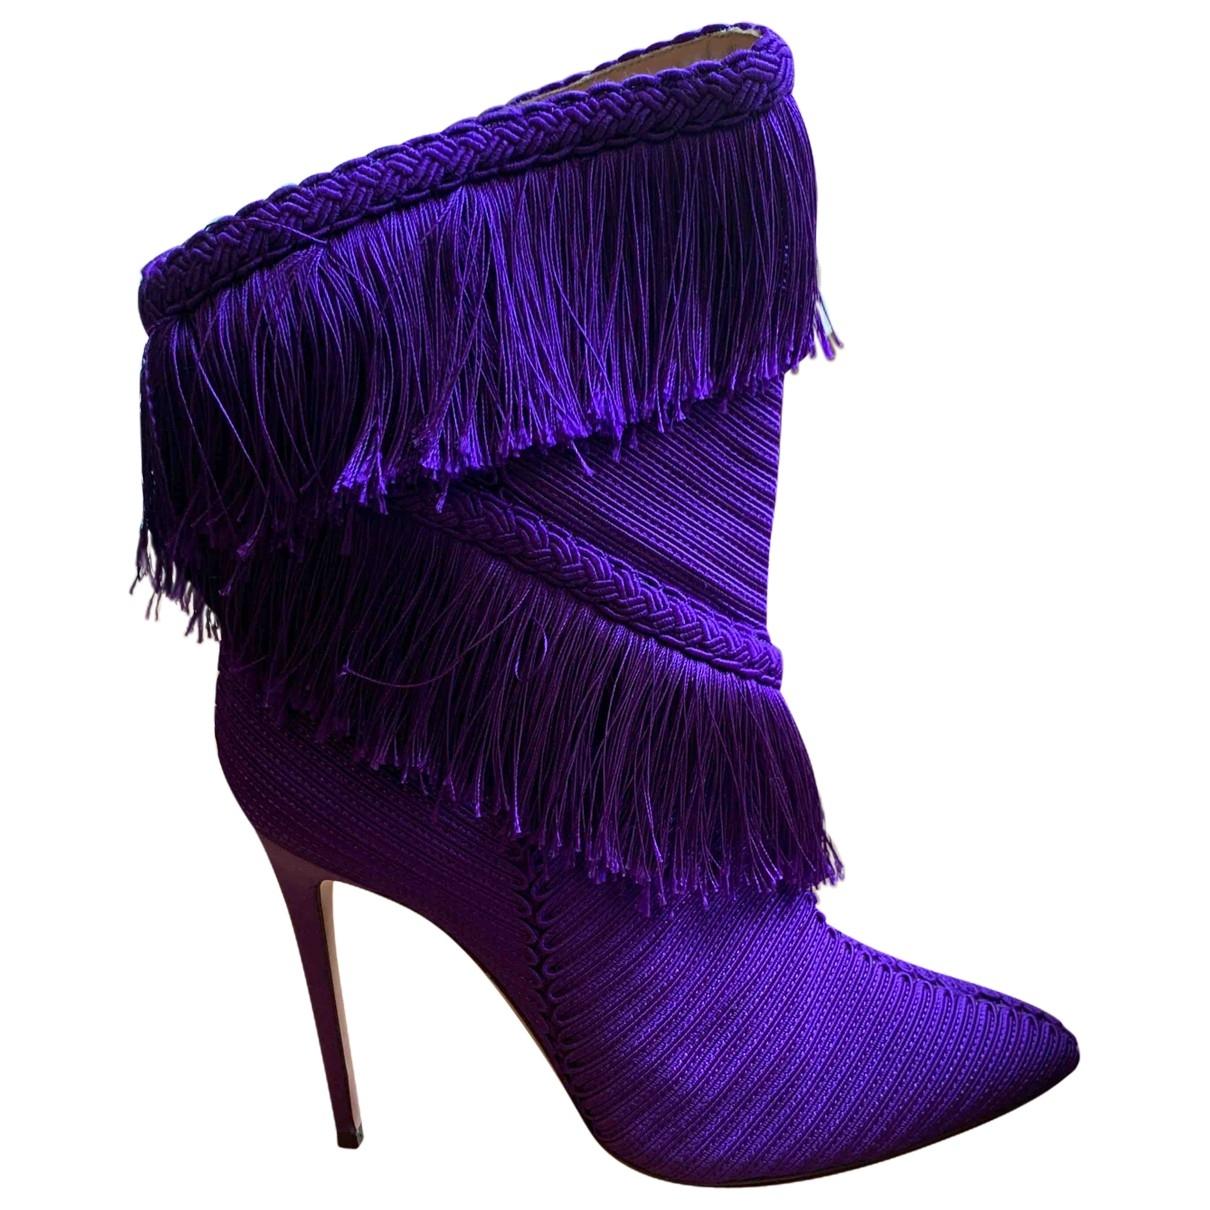 Aquazzura - Boots   pour femme en cuir - violet